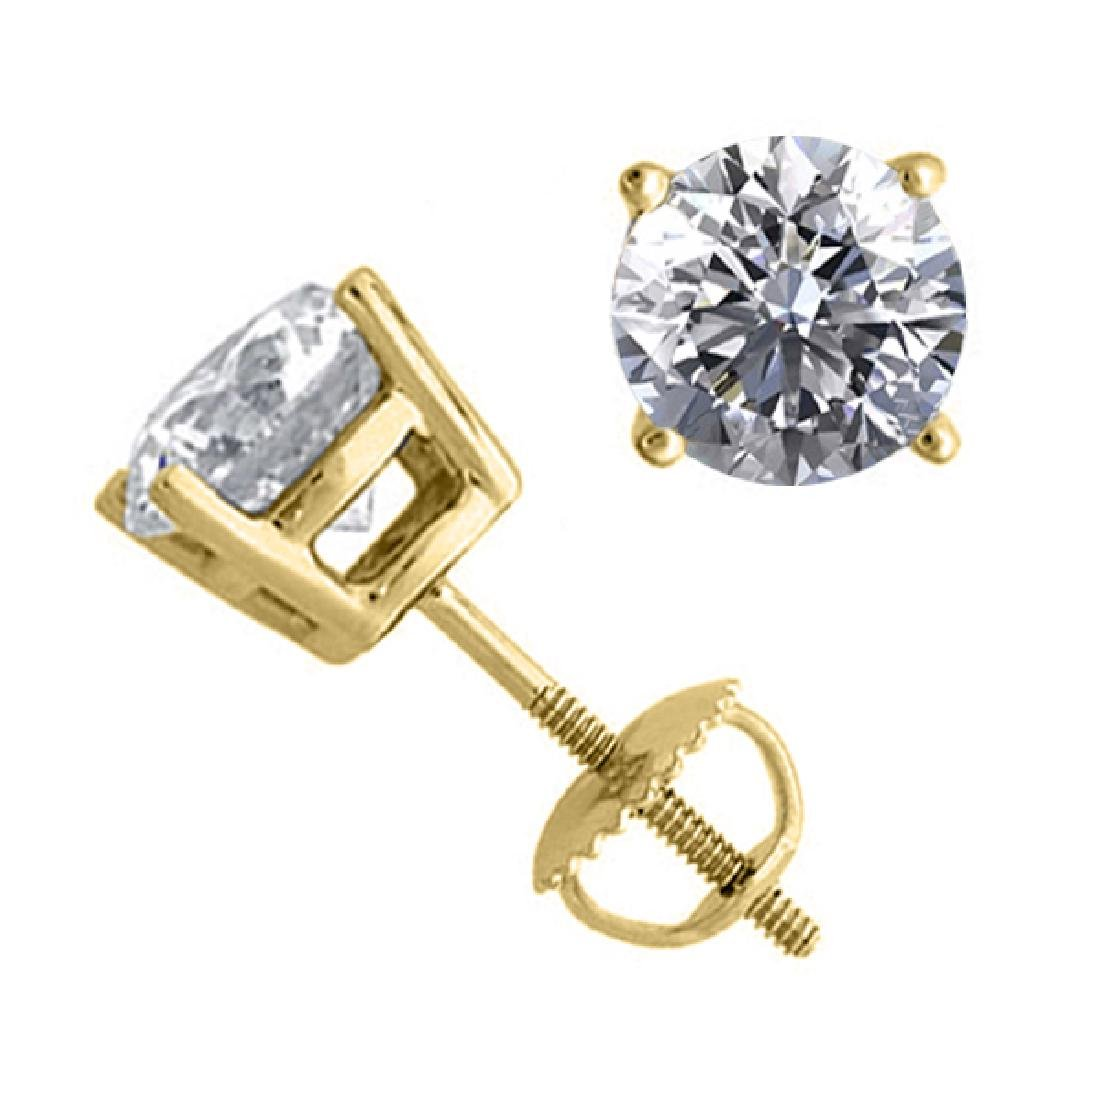 14K Yellow Gold Jewelry 2.04 ctw Natural Diamond Stud